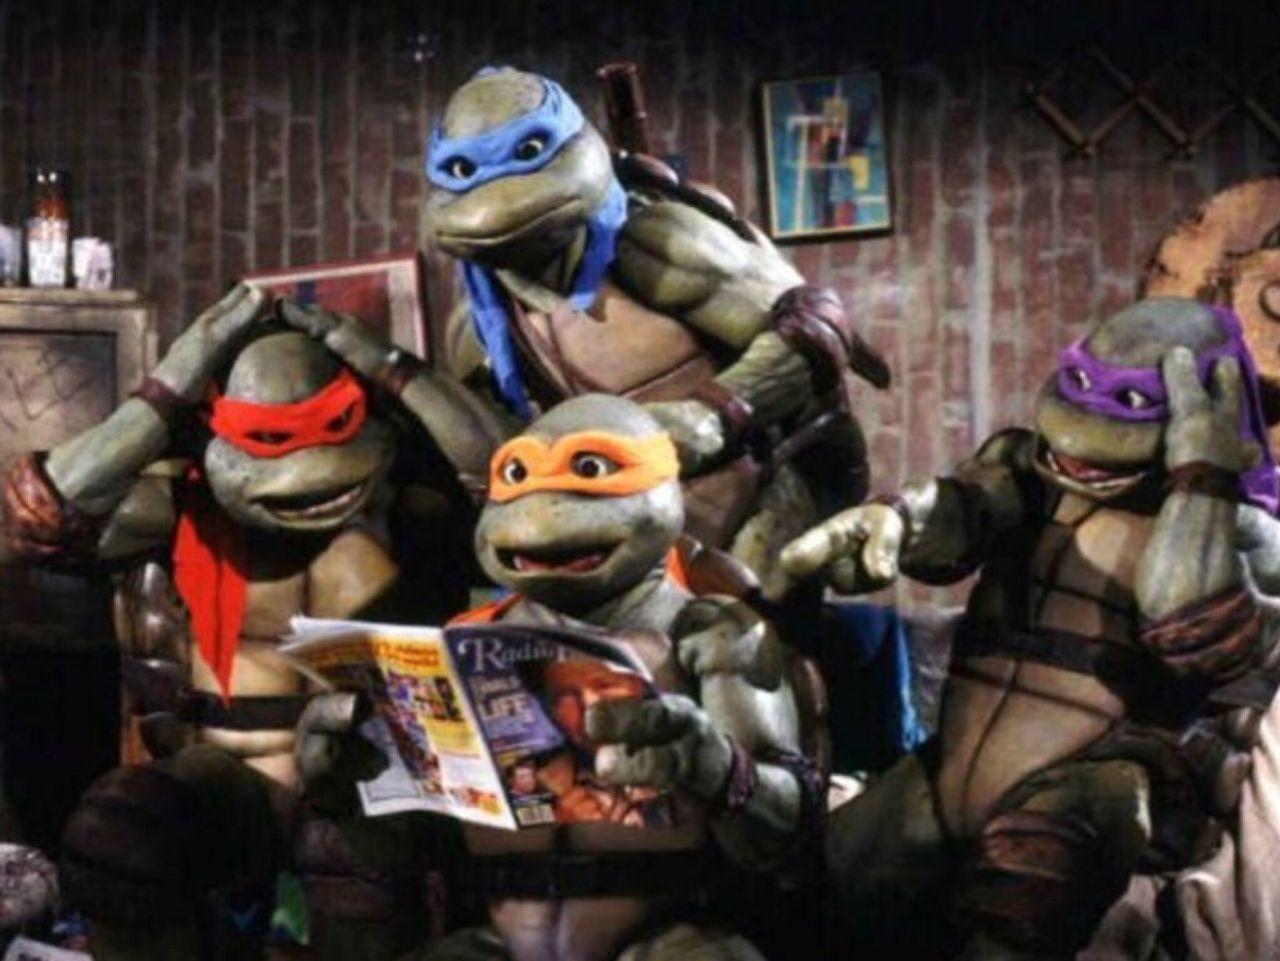 All Three Original Teenage Mutant Ninja Turtles Movies Coming to HBO Max